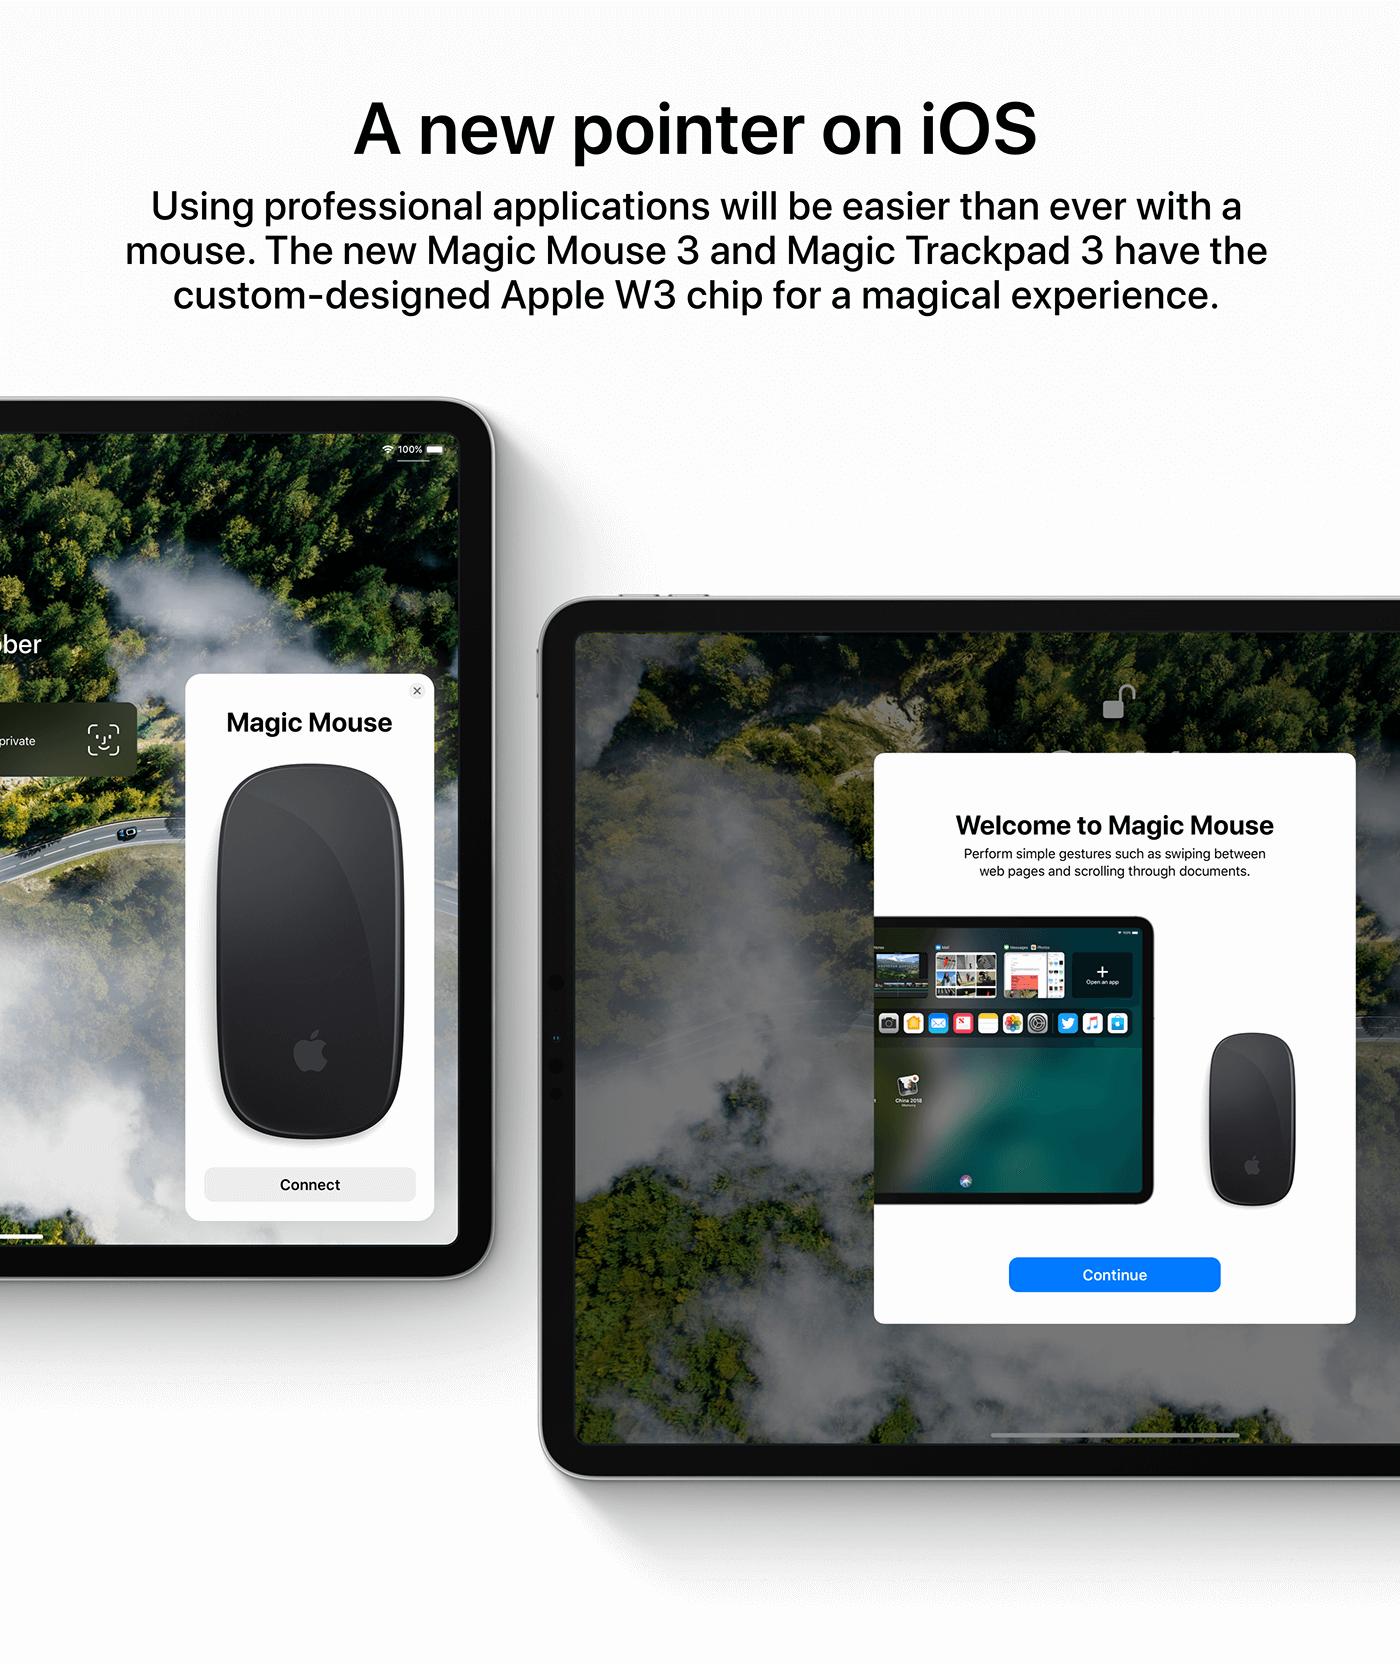 iPad met muis